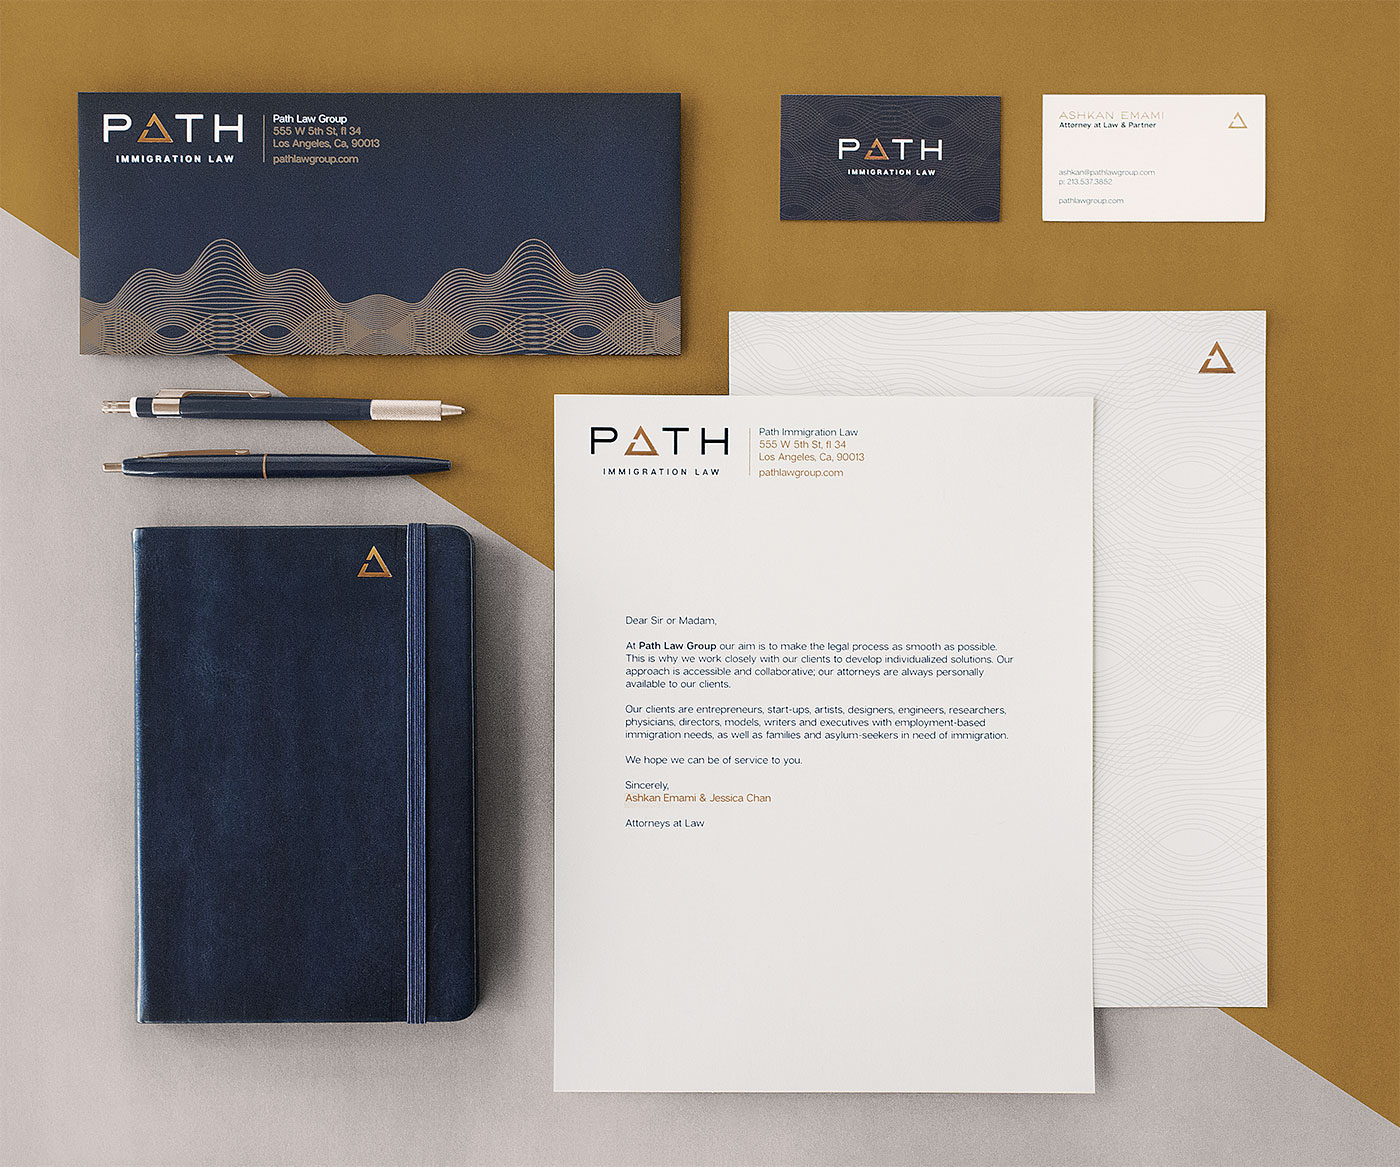 Brand Design brand law path law Immigration Stationery metallic foil icons Logotype wordmark